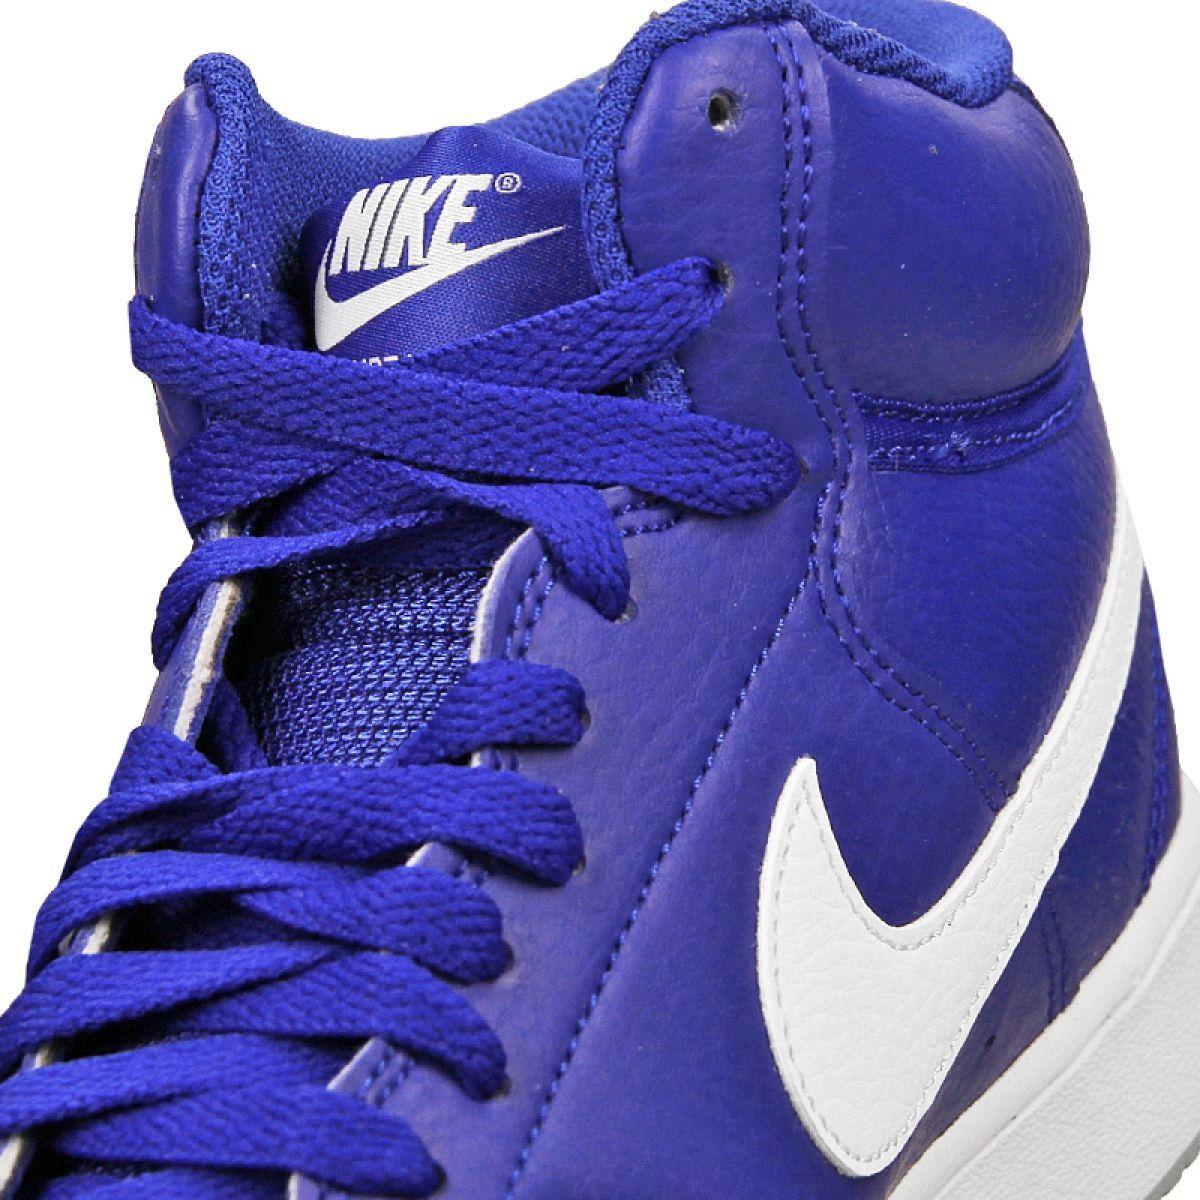 Buty Nike Court Vision Mid M Cd5466 400 Niebieskie Nike Blue Shoes Mens Nike Shoes